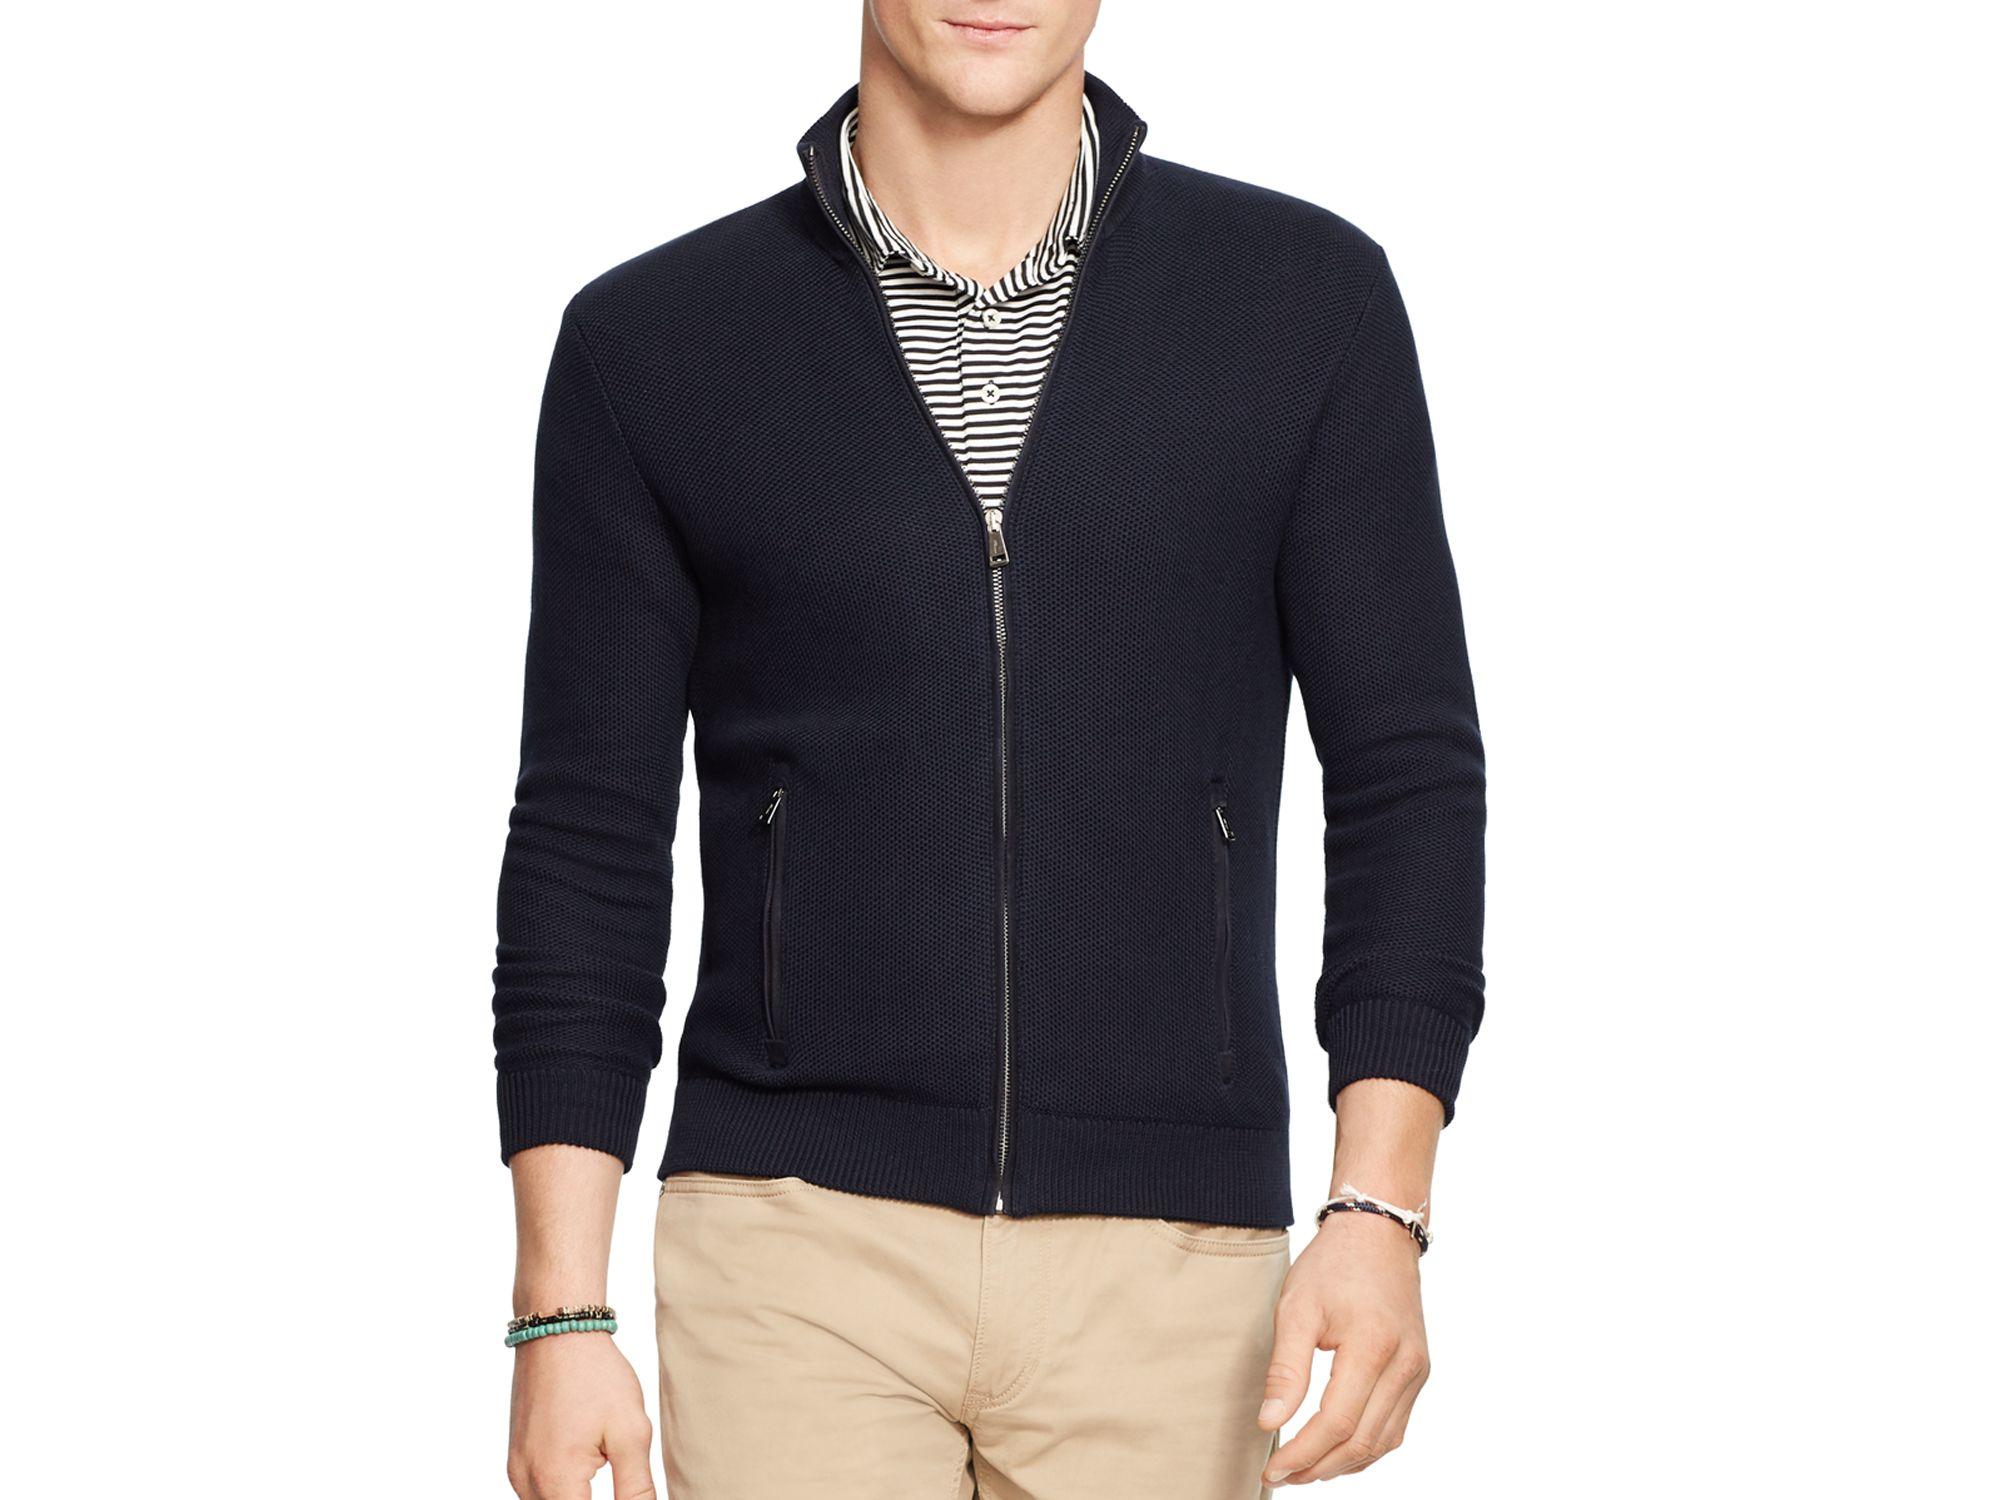 398cdad94 Polo Ralph Lauren Pima Cotton Full Zip Sweater in Black for Men - Lyst